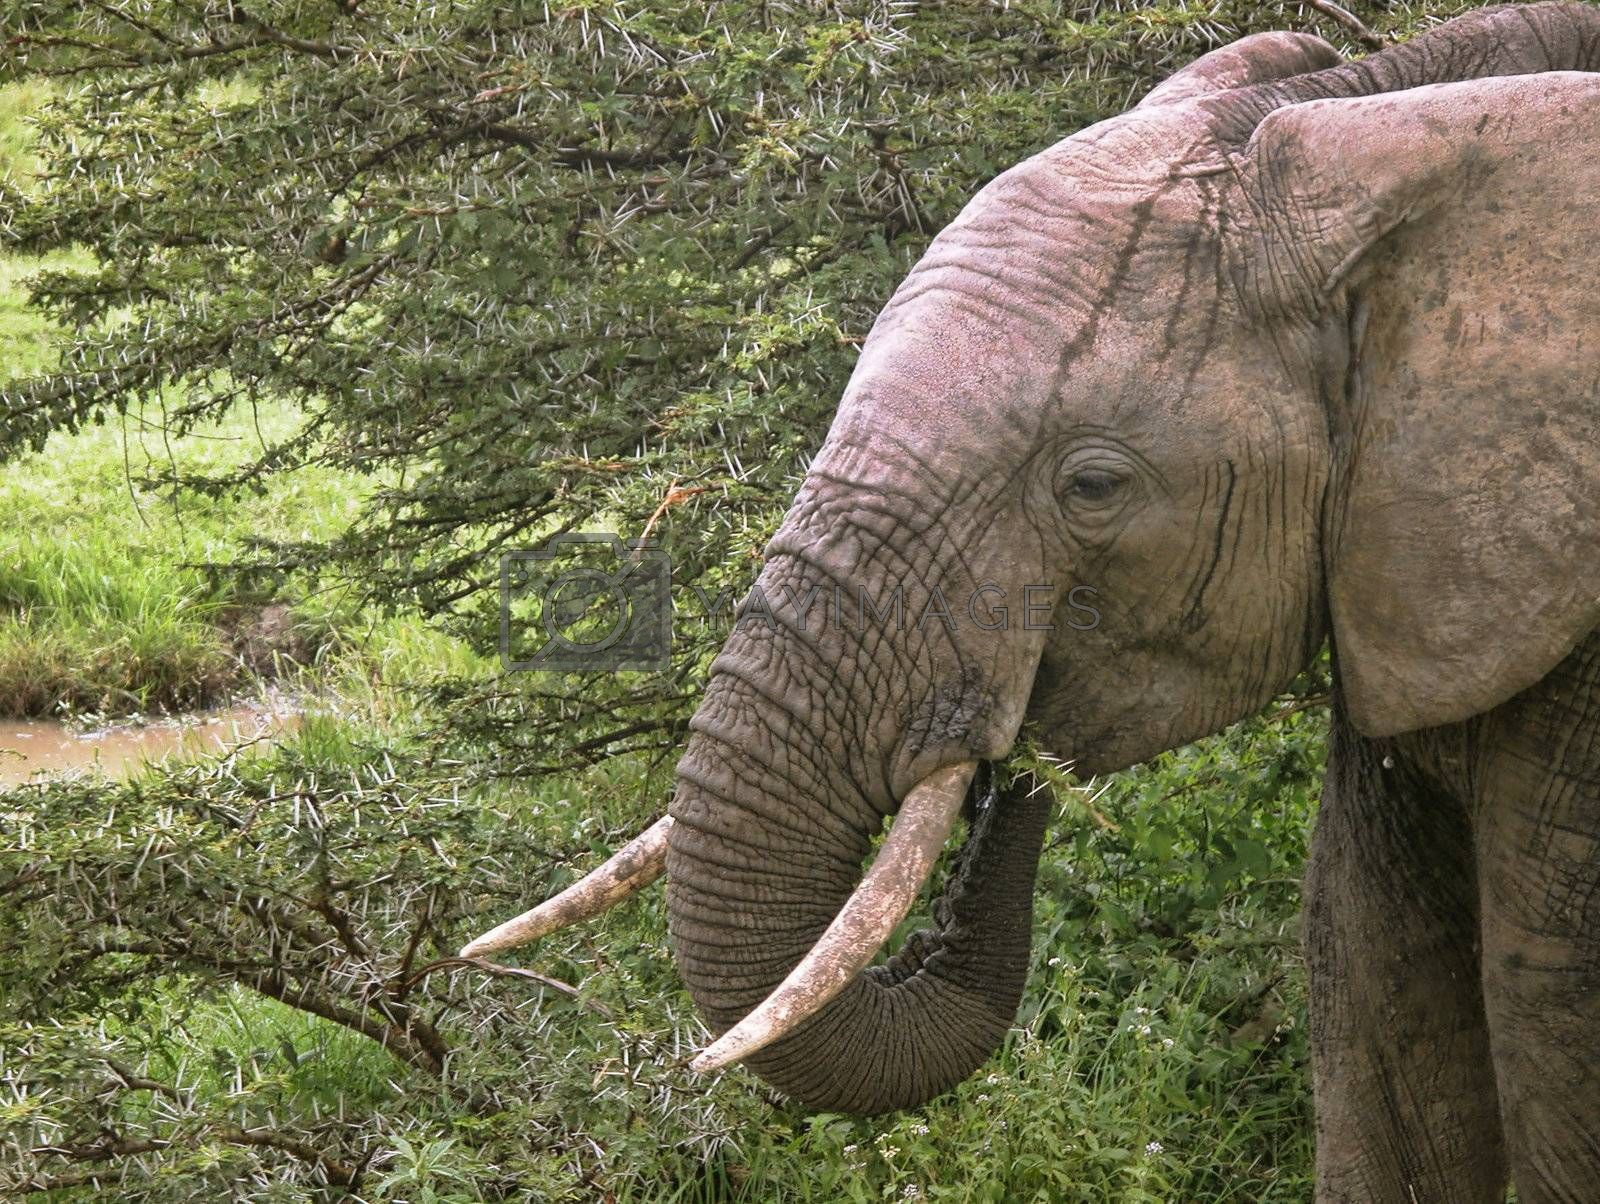 Detail of Kenya, Africa during Spring 2005 by jovannig